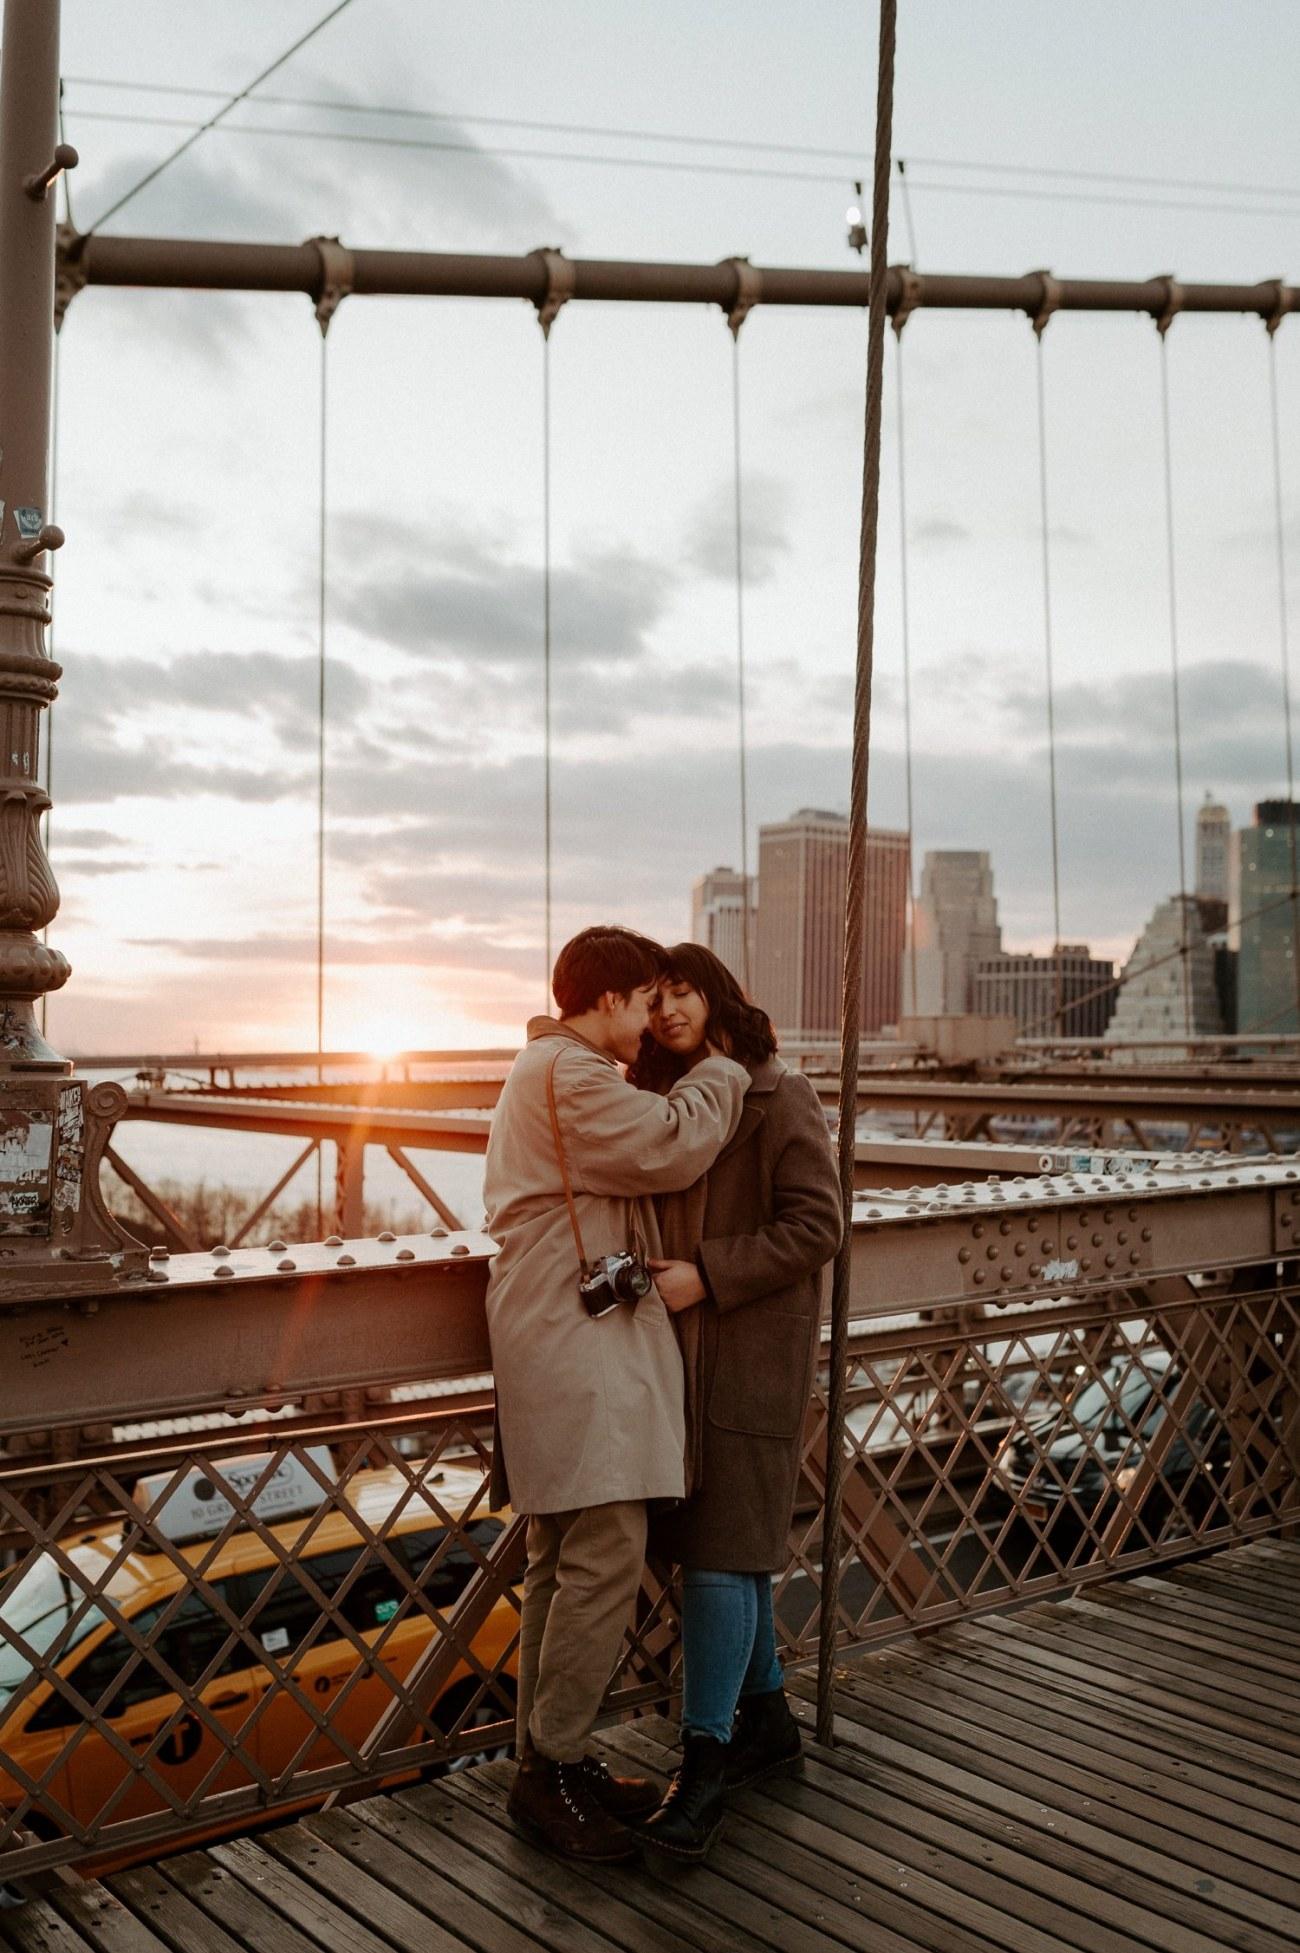 Brooklyn Bridge Sunset Couple Session New York Wedding Photographer NYC Best Engagement Photos Location Anais Possamai Photography 10